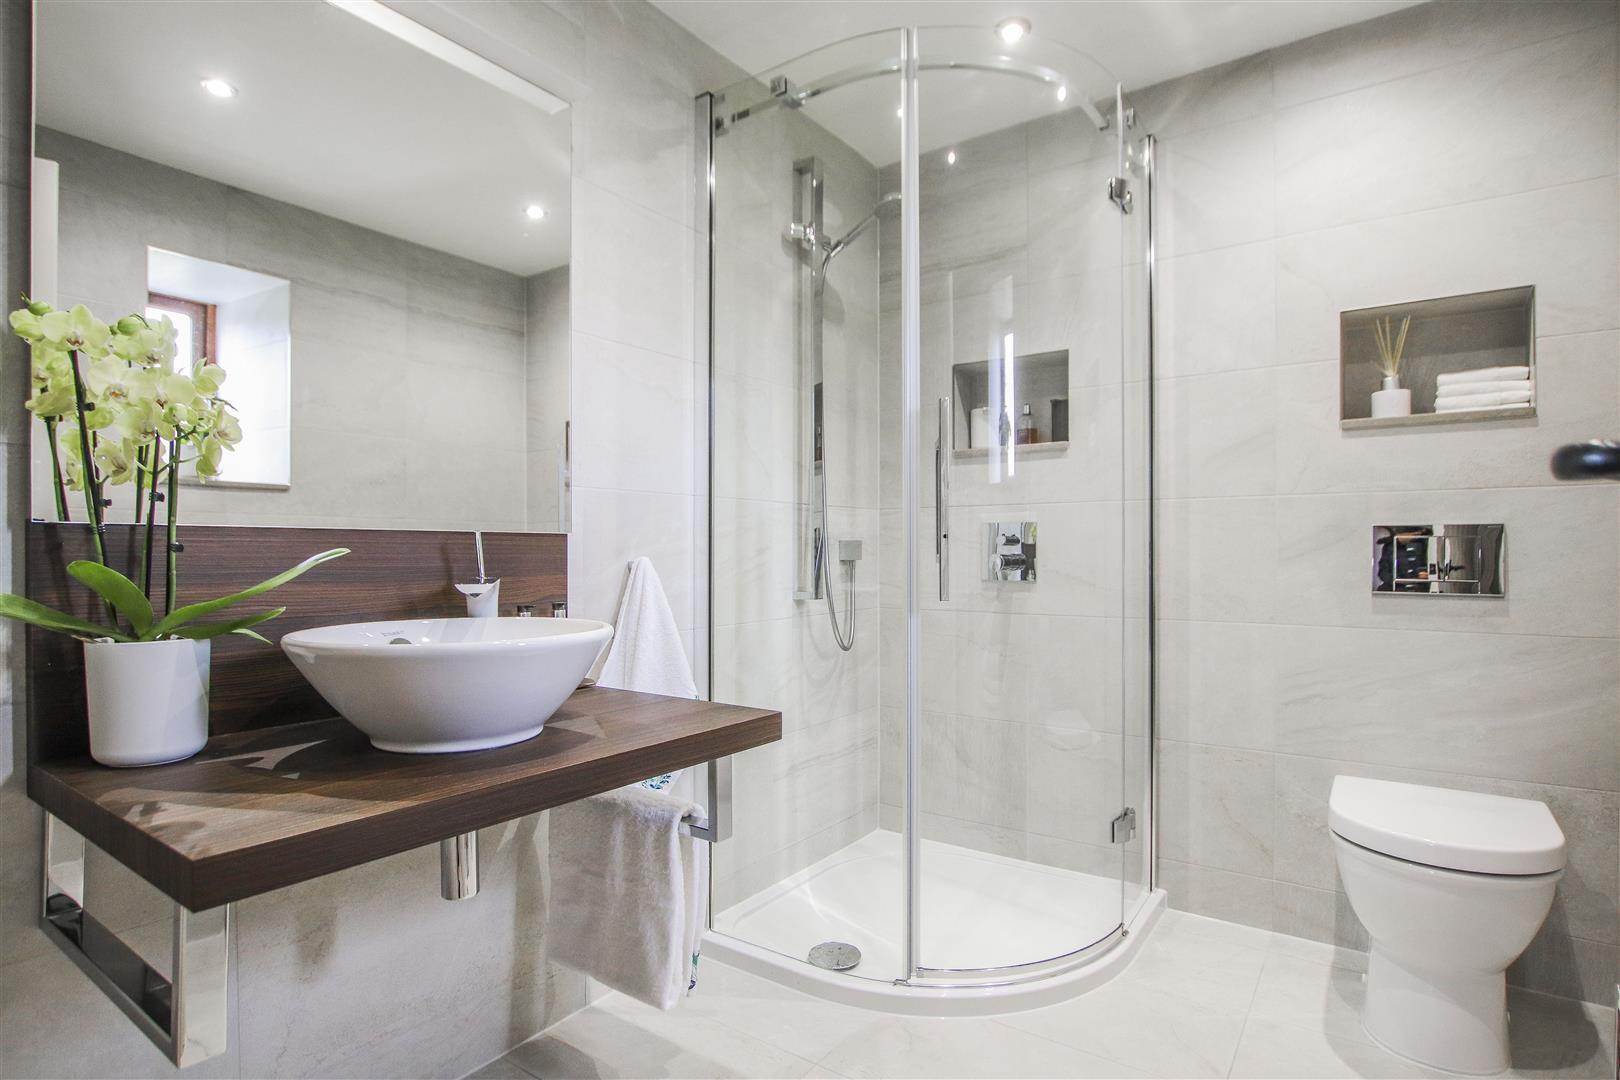 5 Bedroom Semi-detached House For Sale - 17.JPG